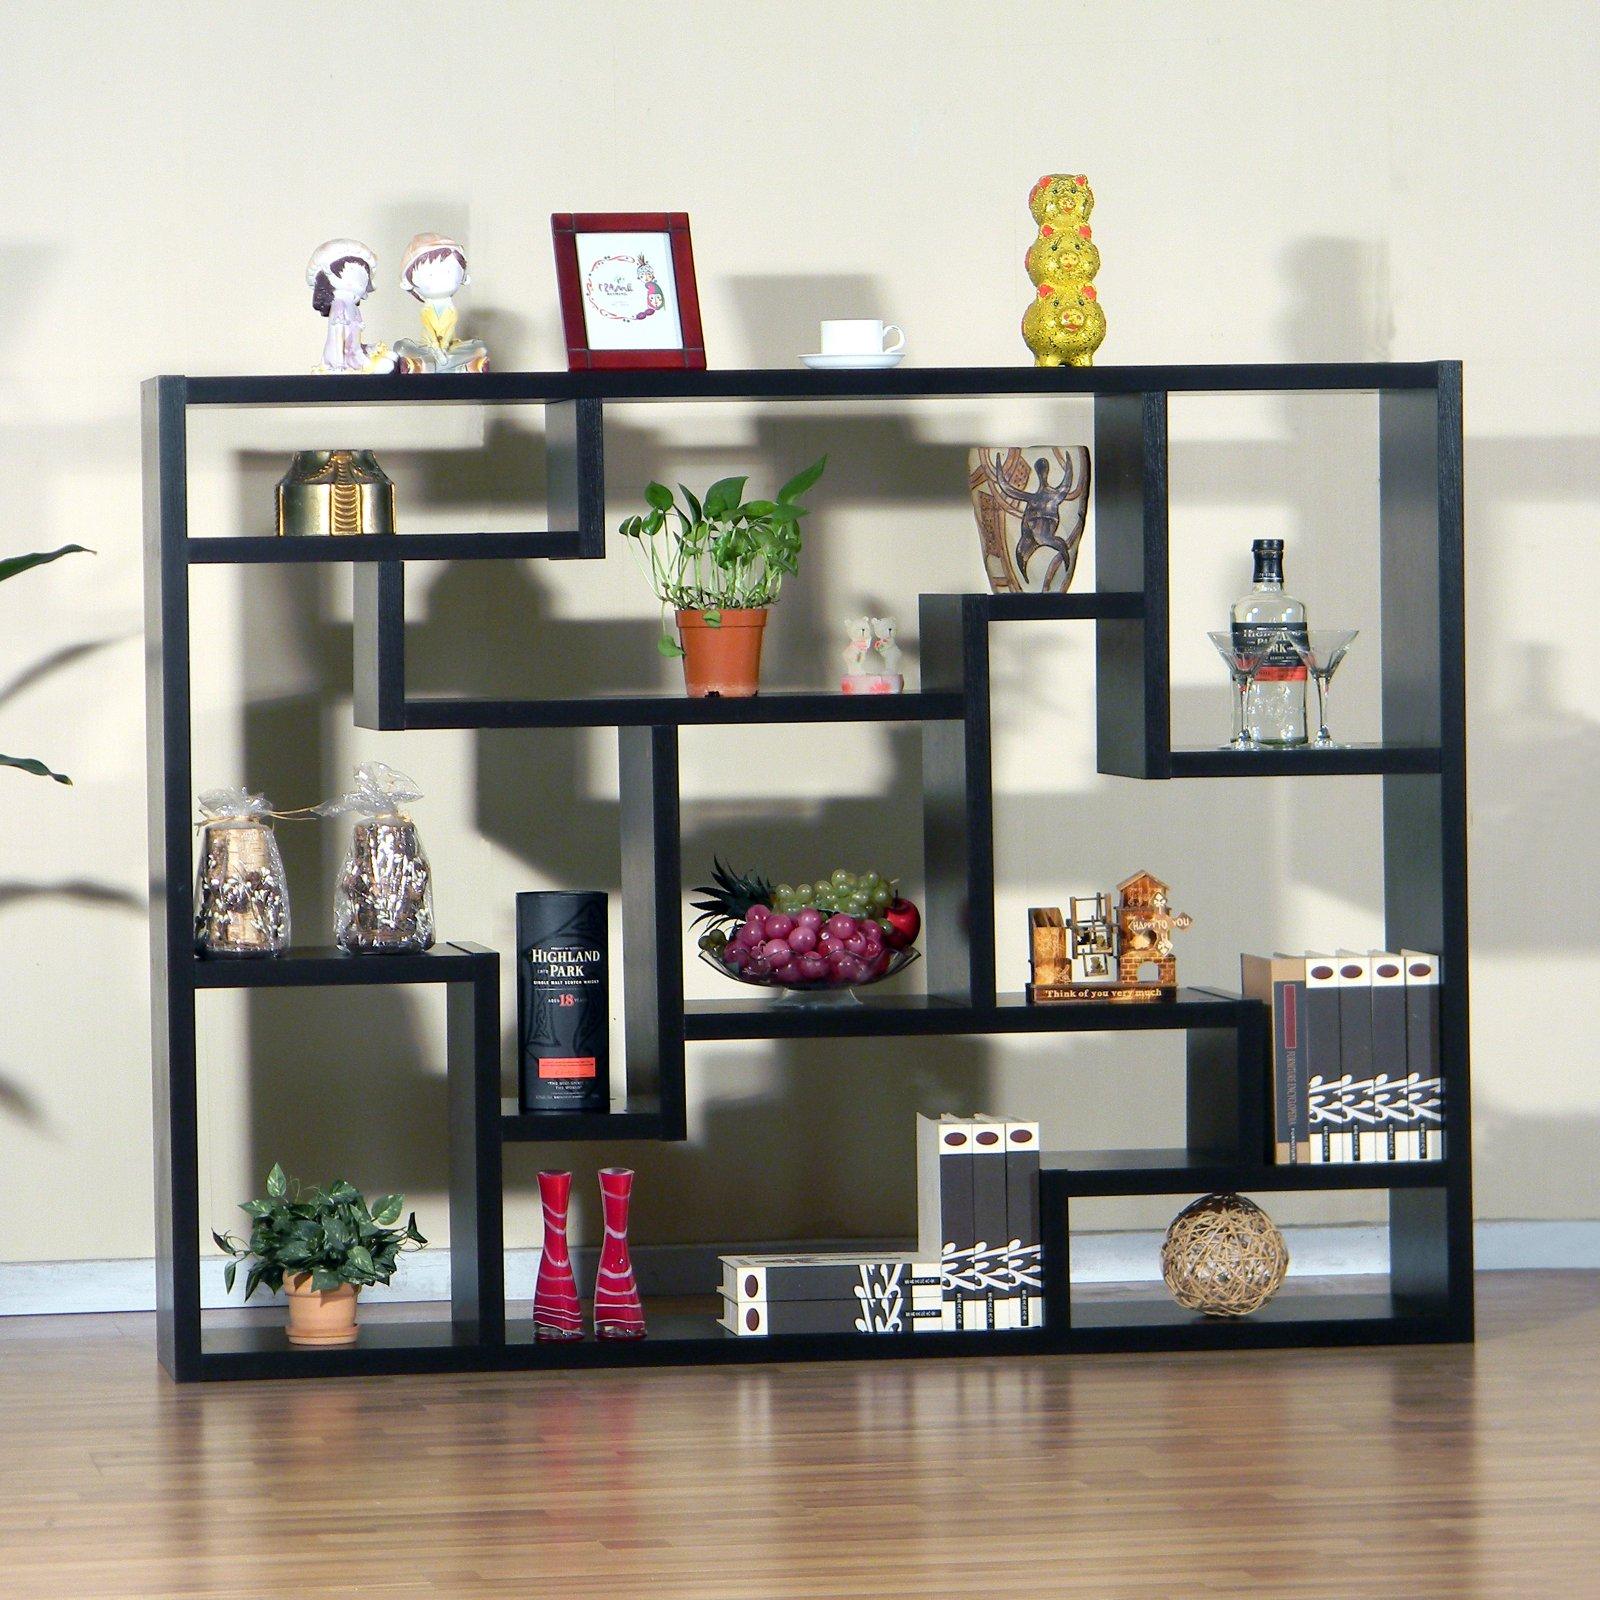 Bookshelf Room Divider furniture of america mandy bookcase/ room divider - walmart